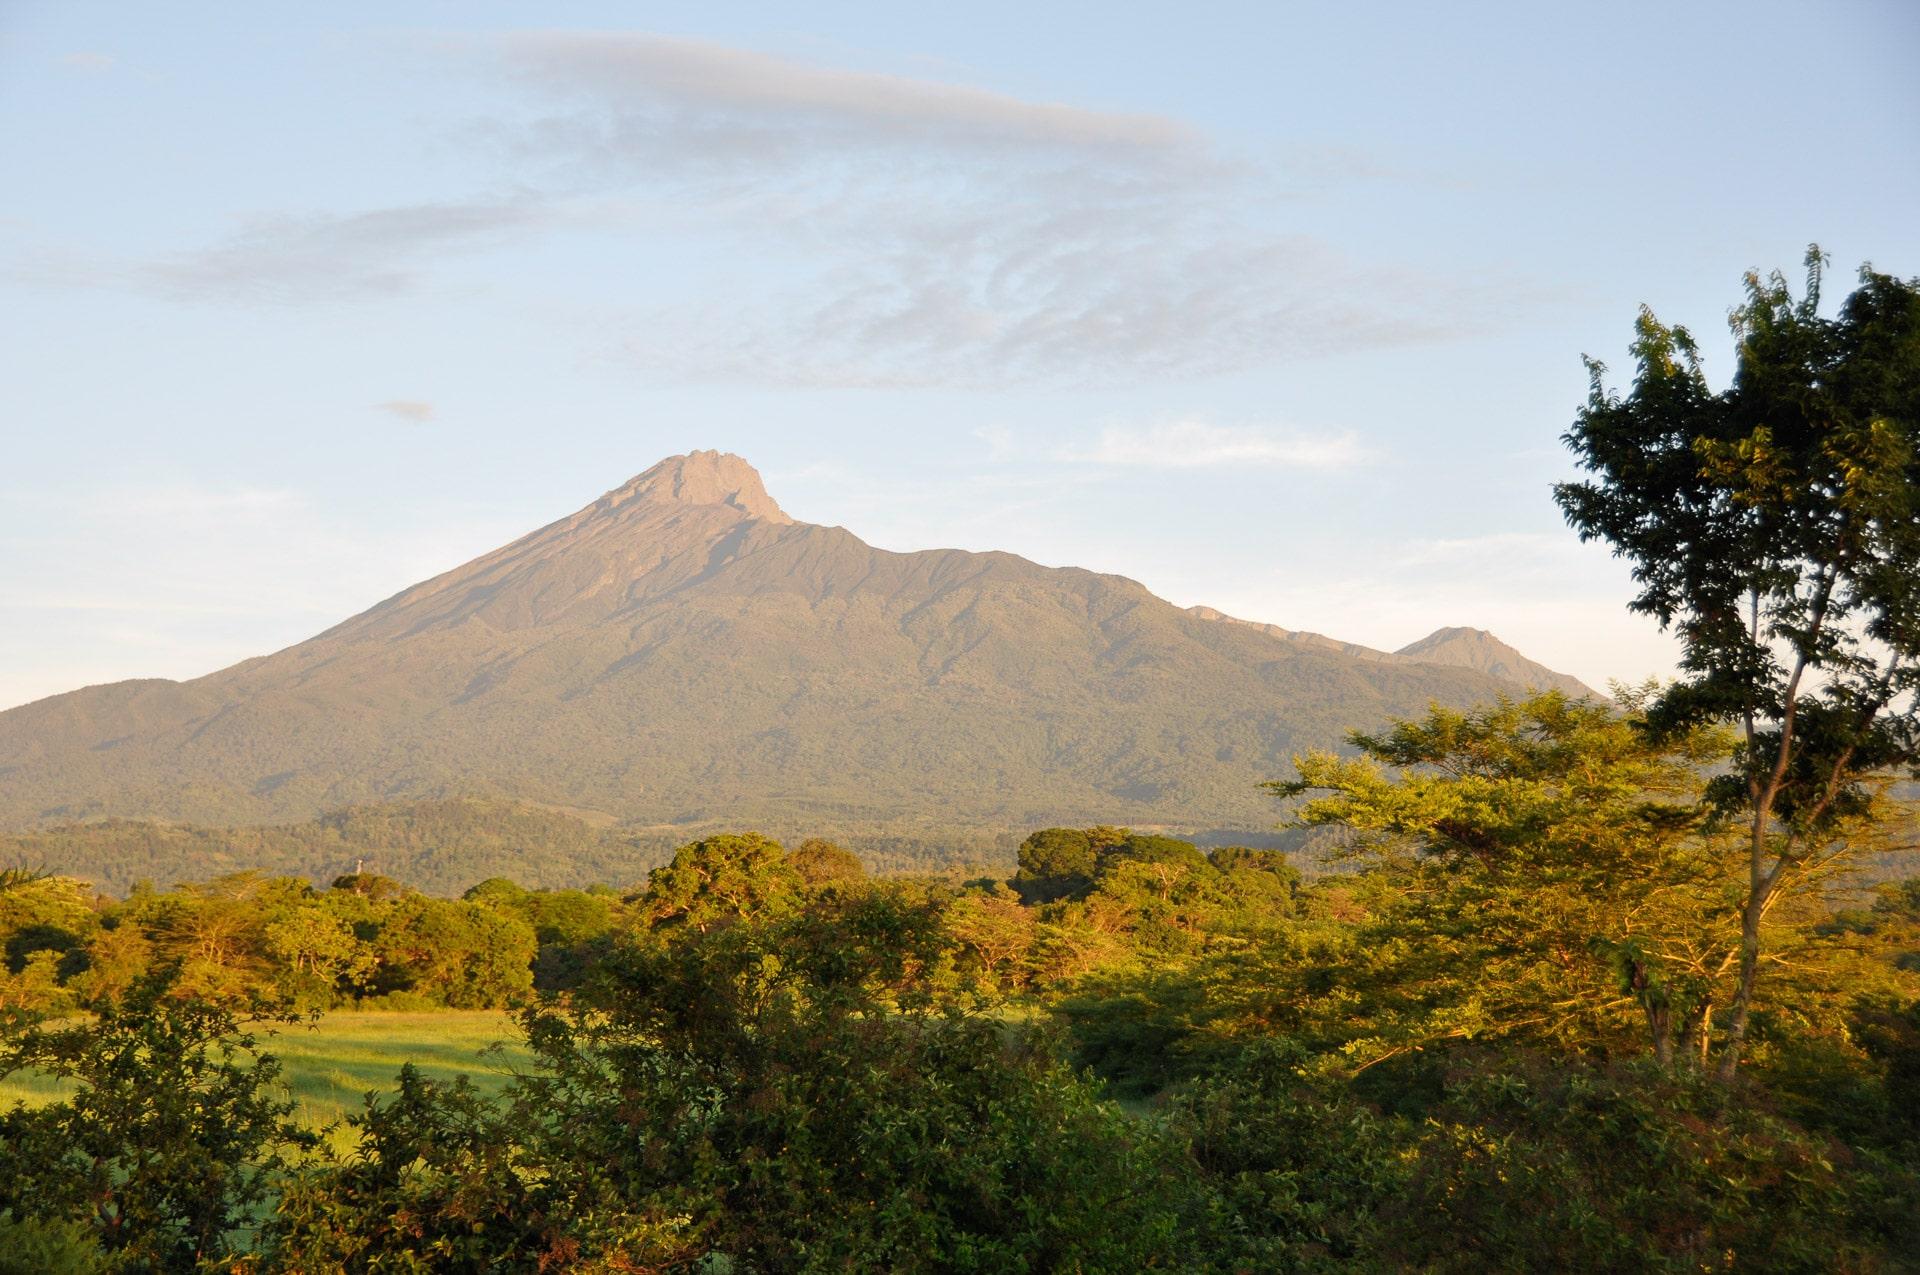 Kilimanjaro-Tansania-Globetrotter-Select-1